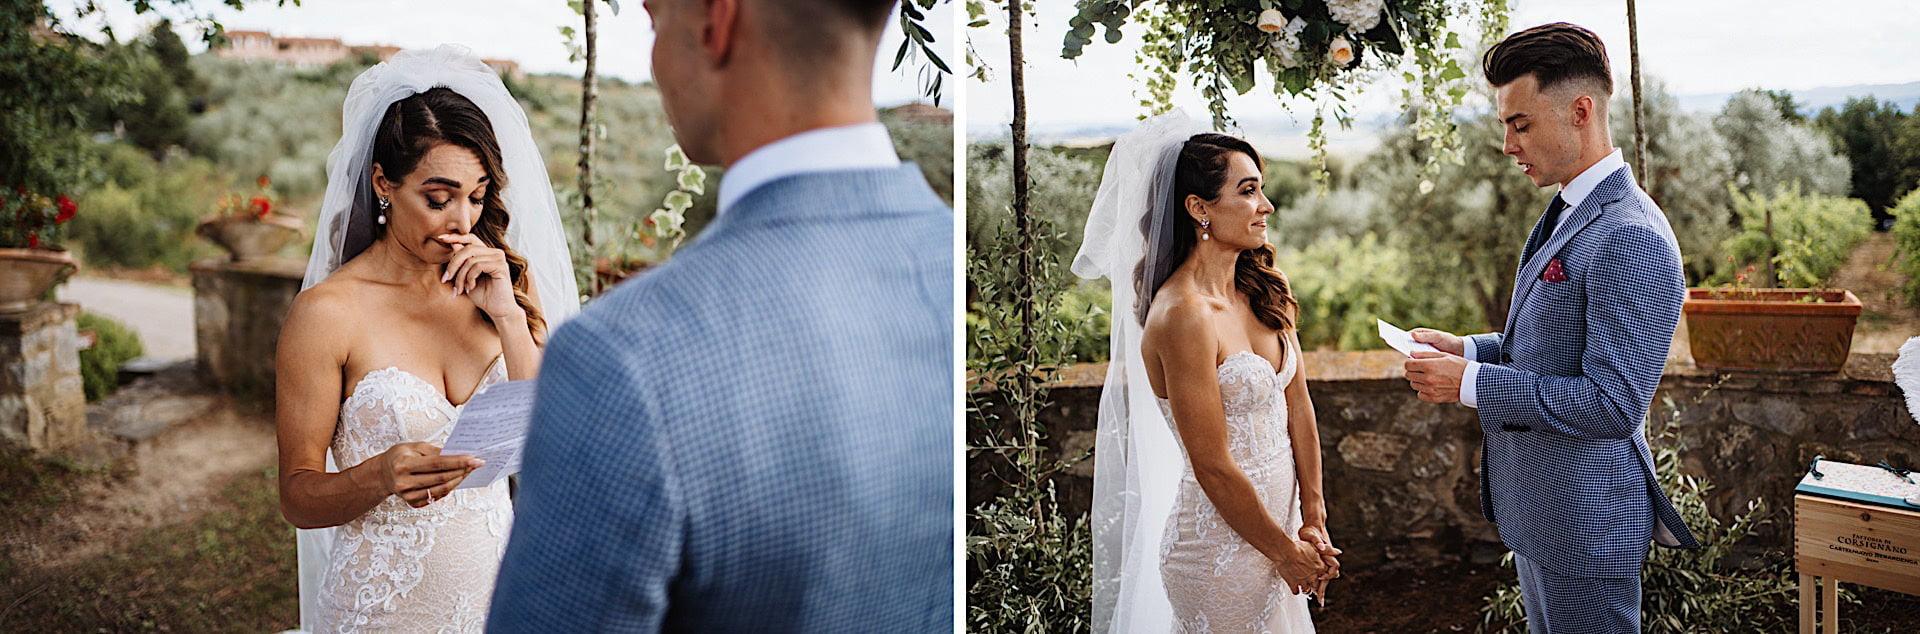 Destination Wedding Tuscany, Teun & Simon Wedding At Corsignano for Destination Wedding Tuscany, Federico Pannacci